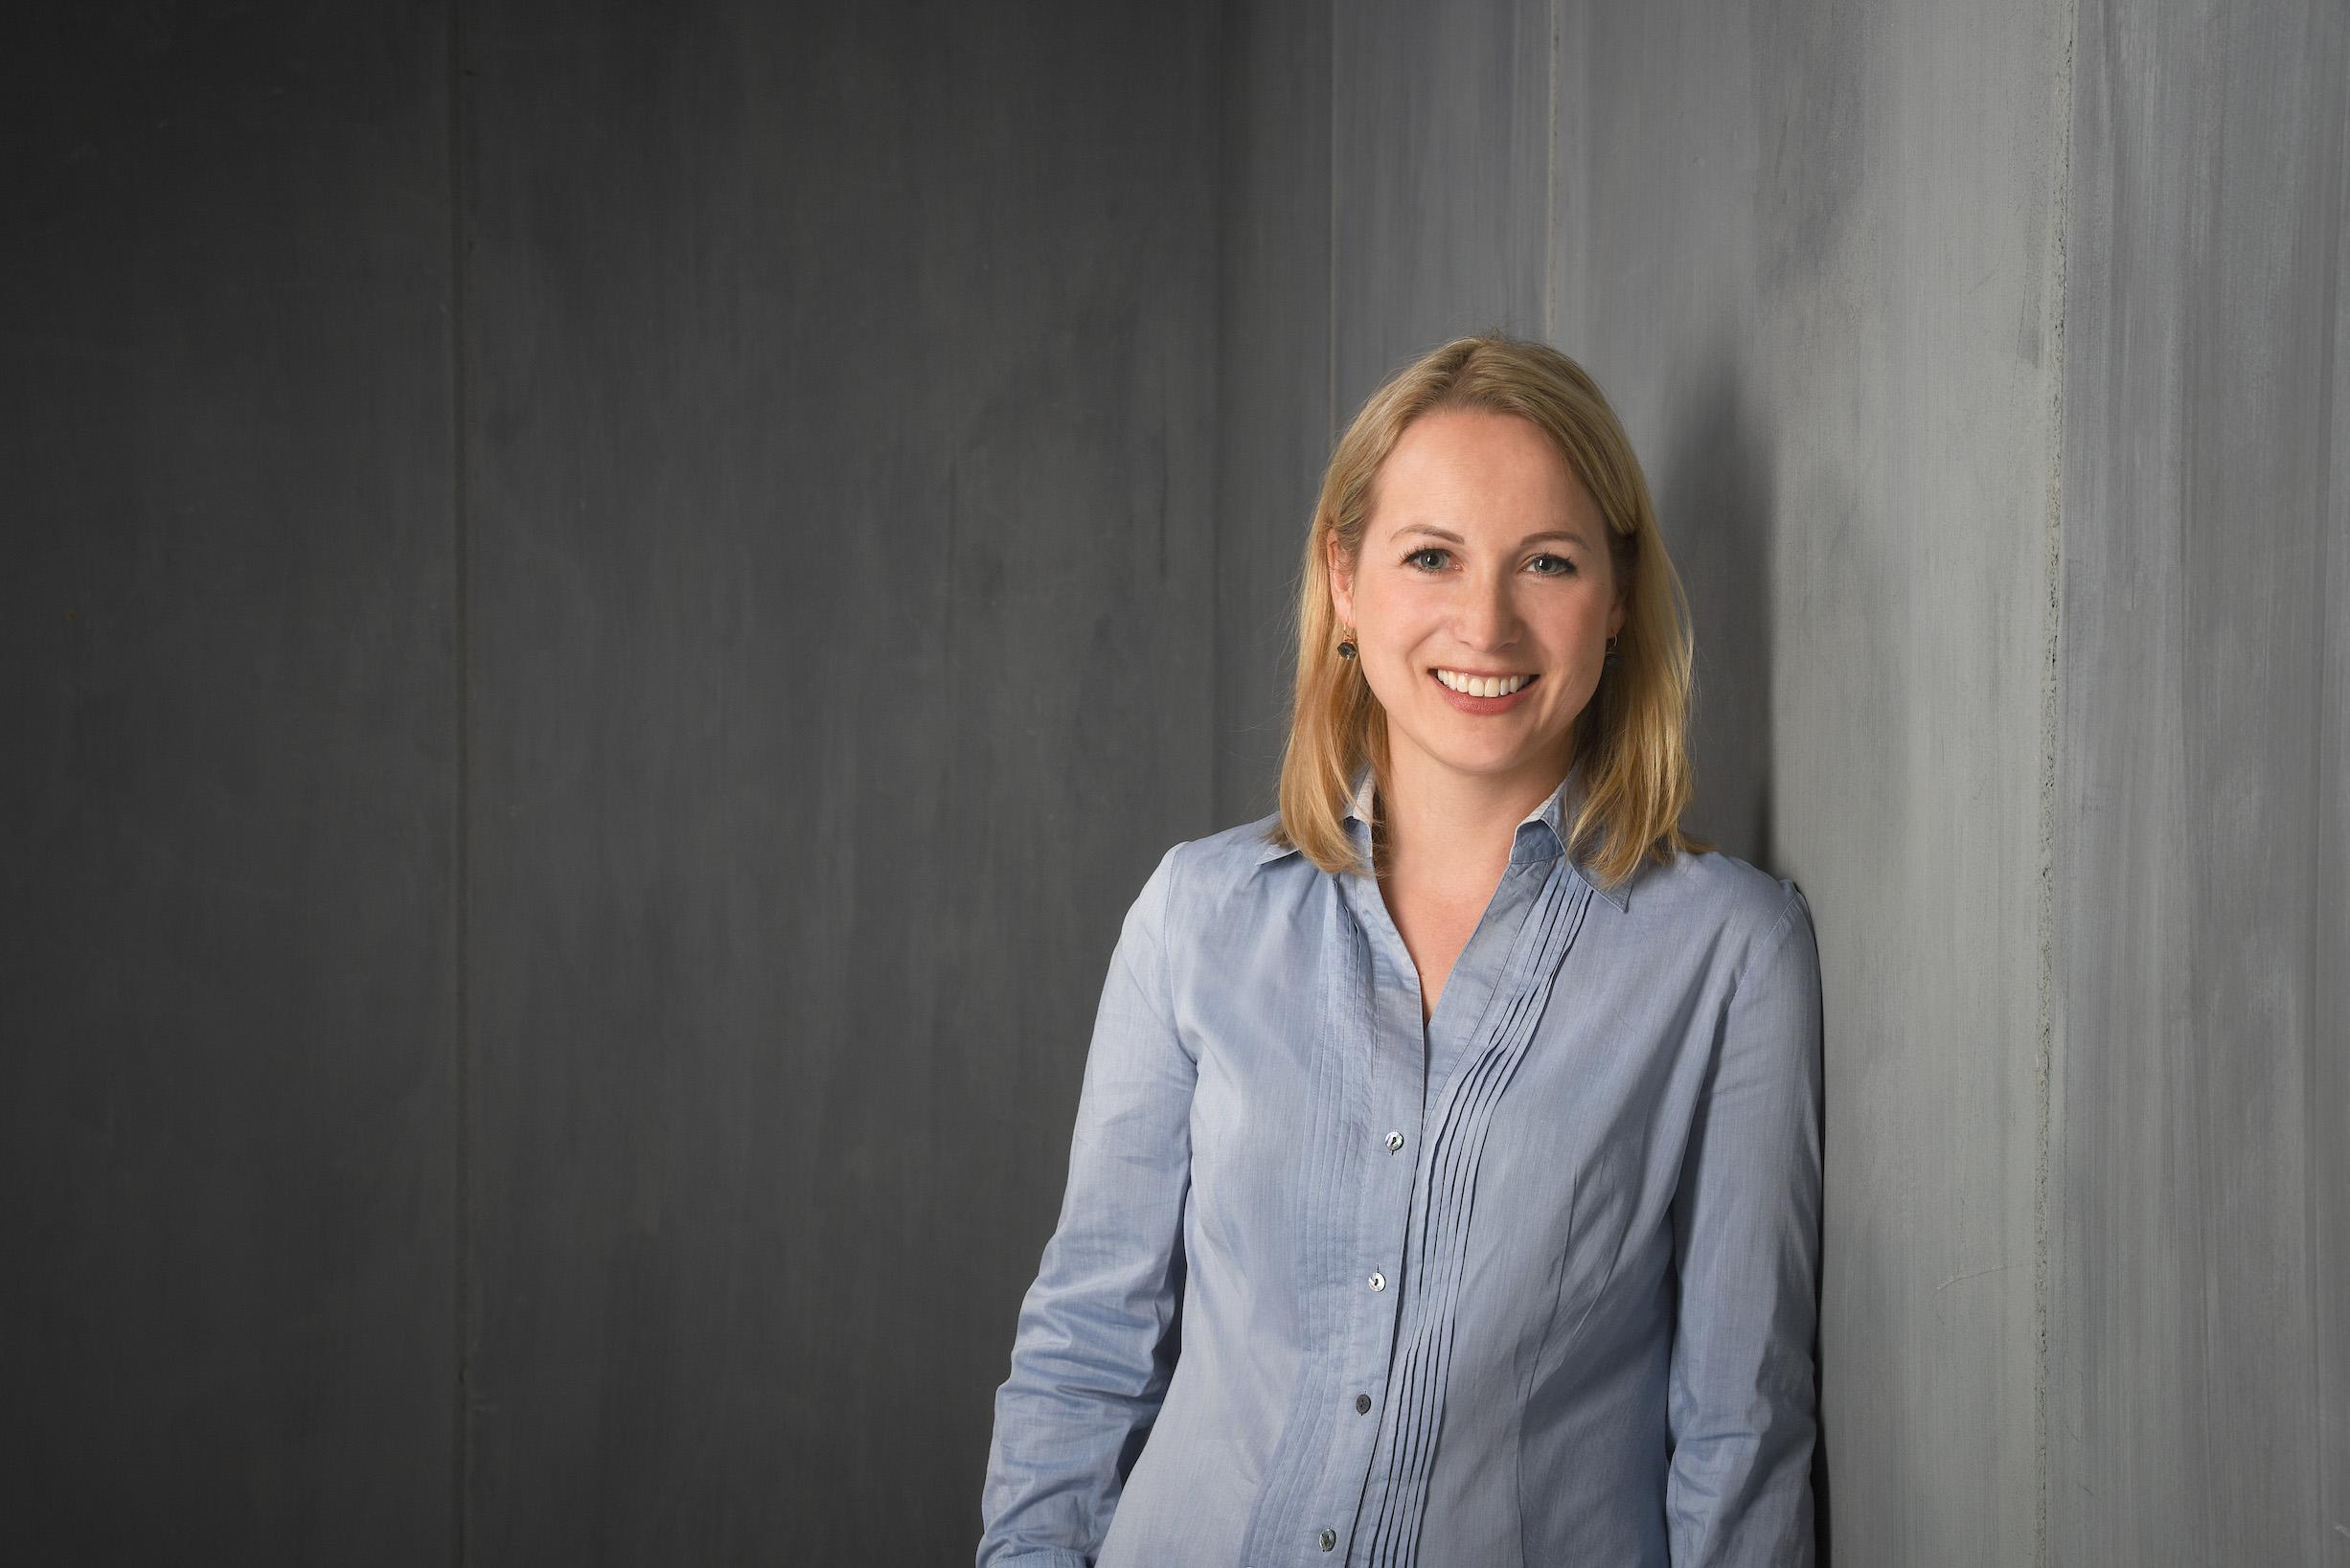 Dr. med. Isabell Lohmann